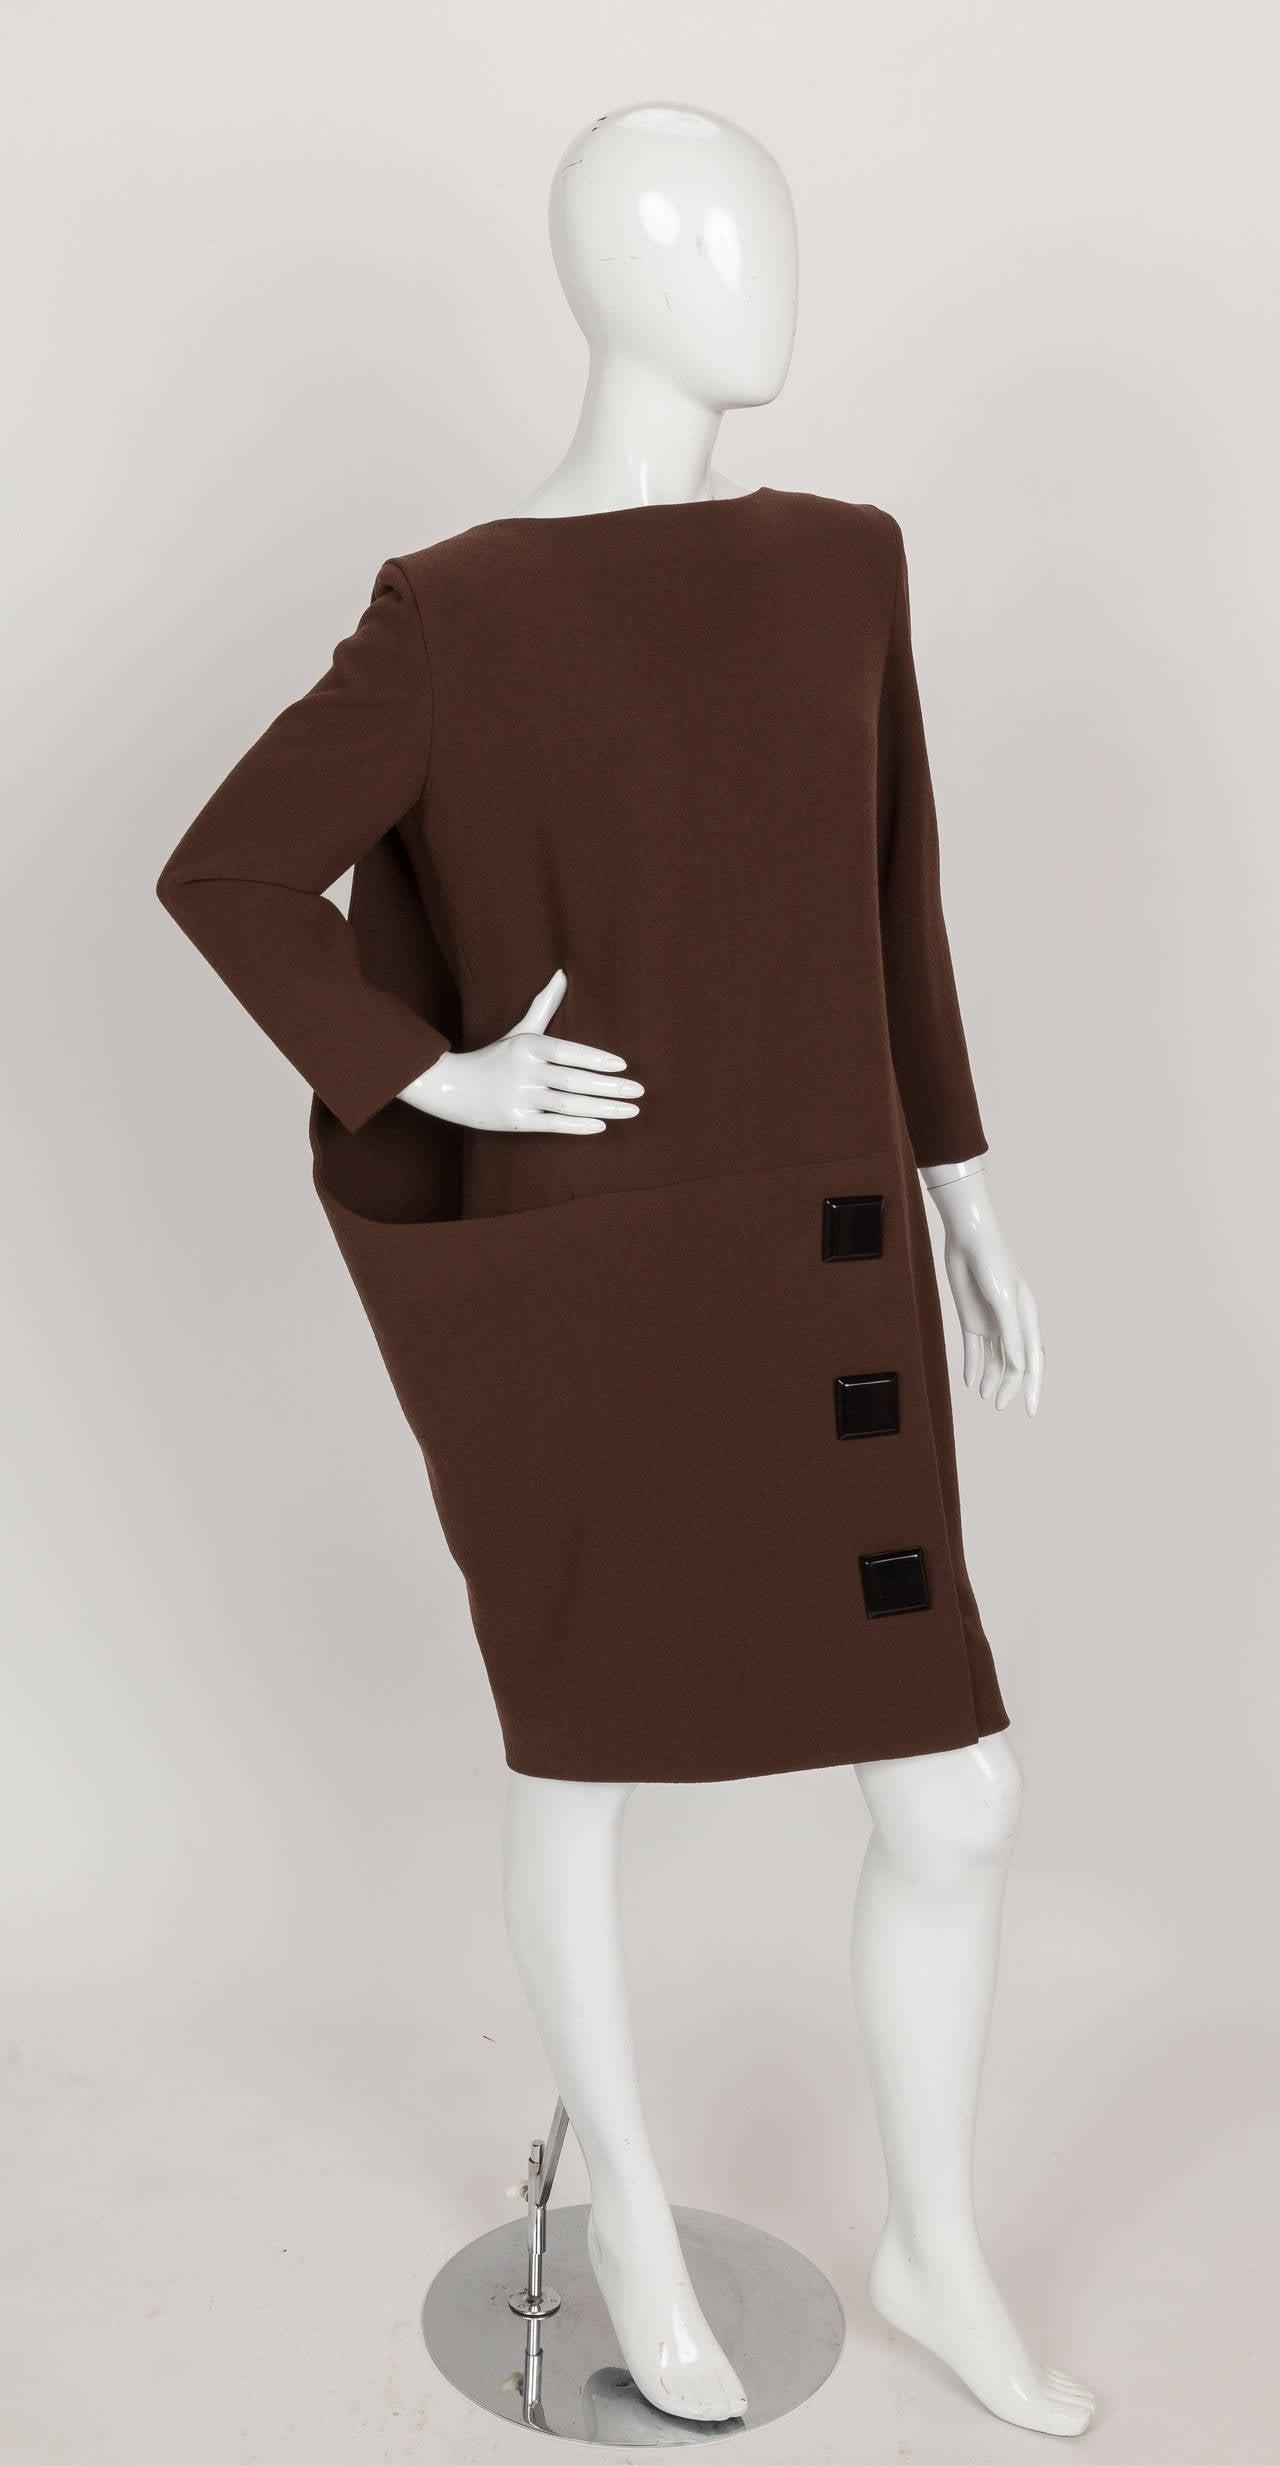 Black Avant Garde Pierre Cardin Haute Couture Asymmetric Wool Cocktail Dress ca. 1992 For Sale